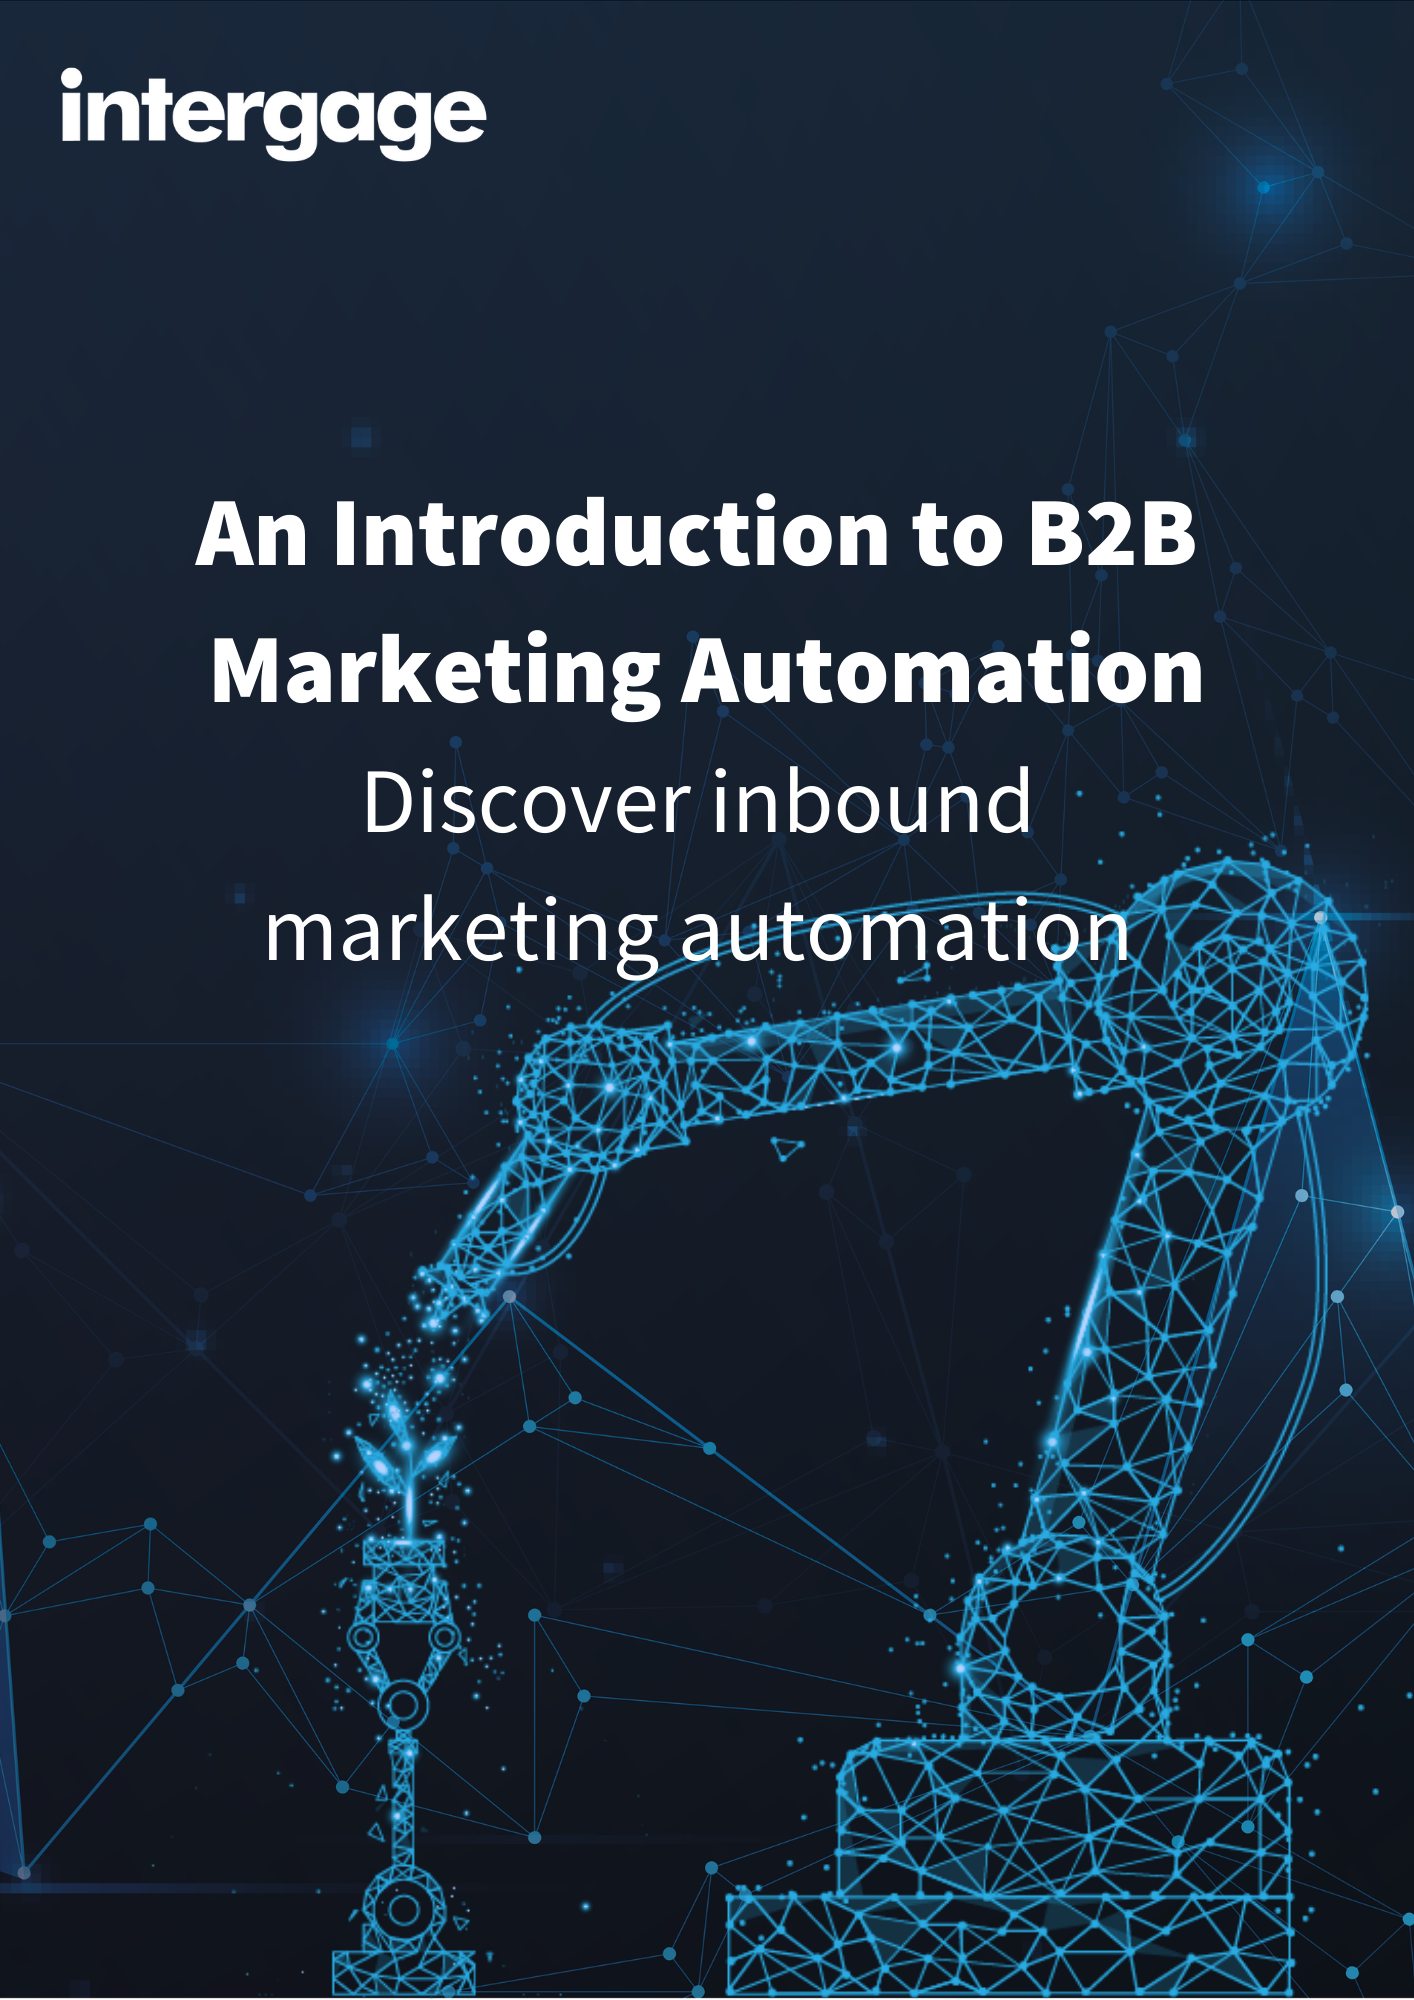 An Intro to B2B Marketing Automation